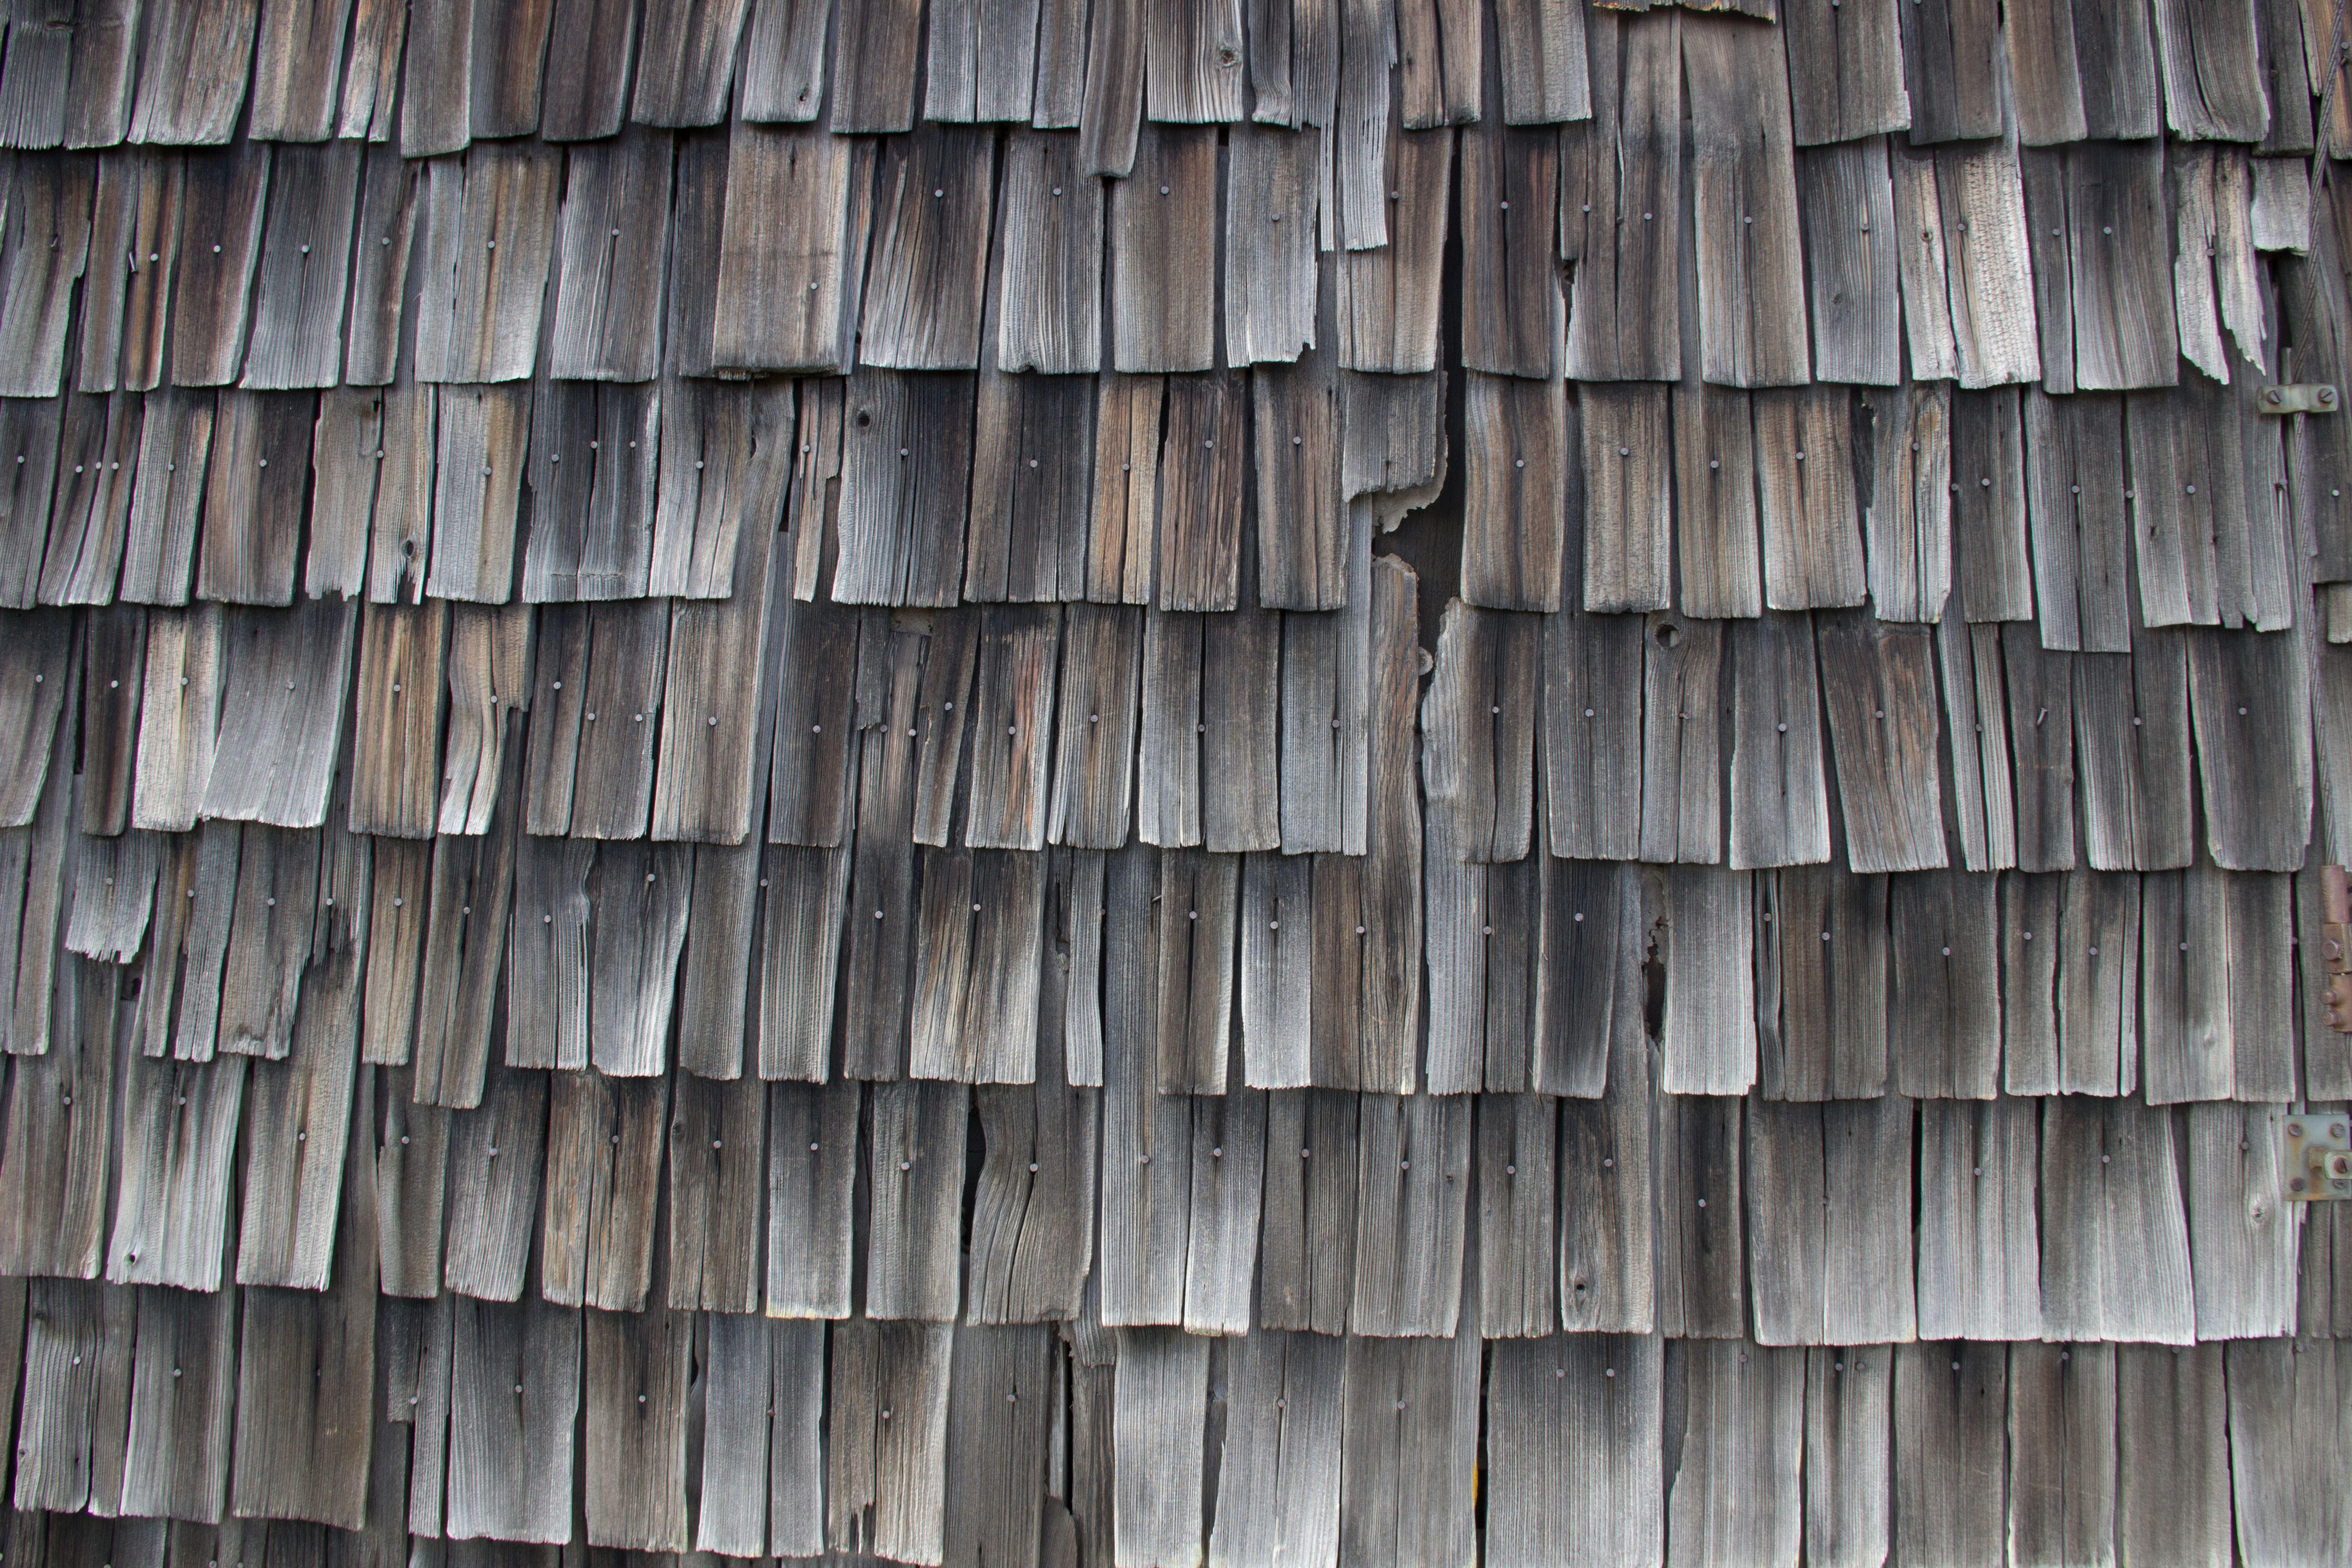 Holzschindeln